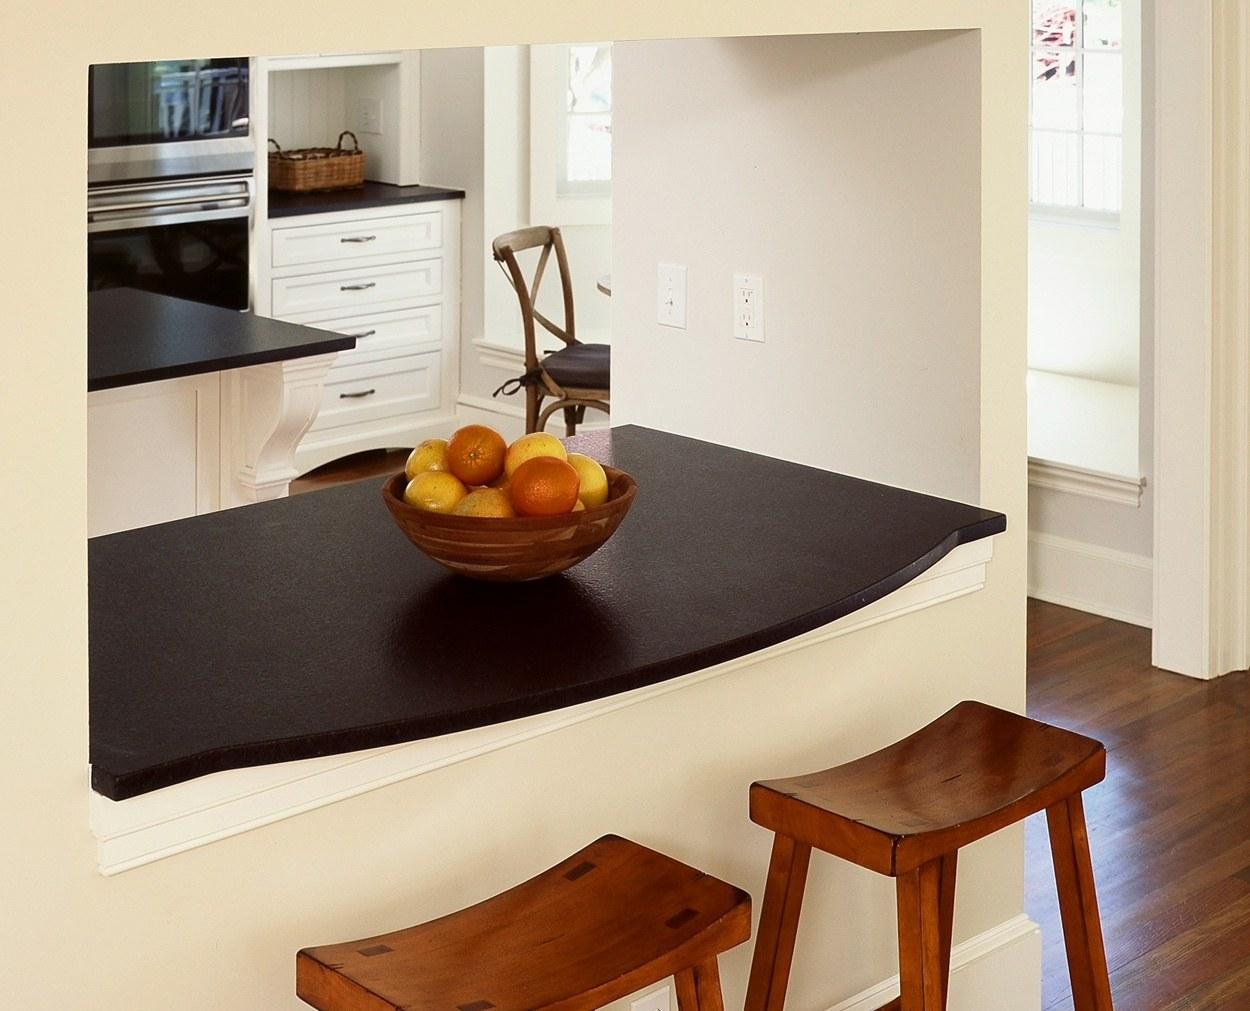 Honed absolute black granite counter passthrough